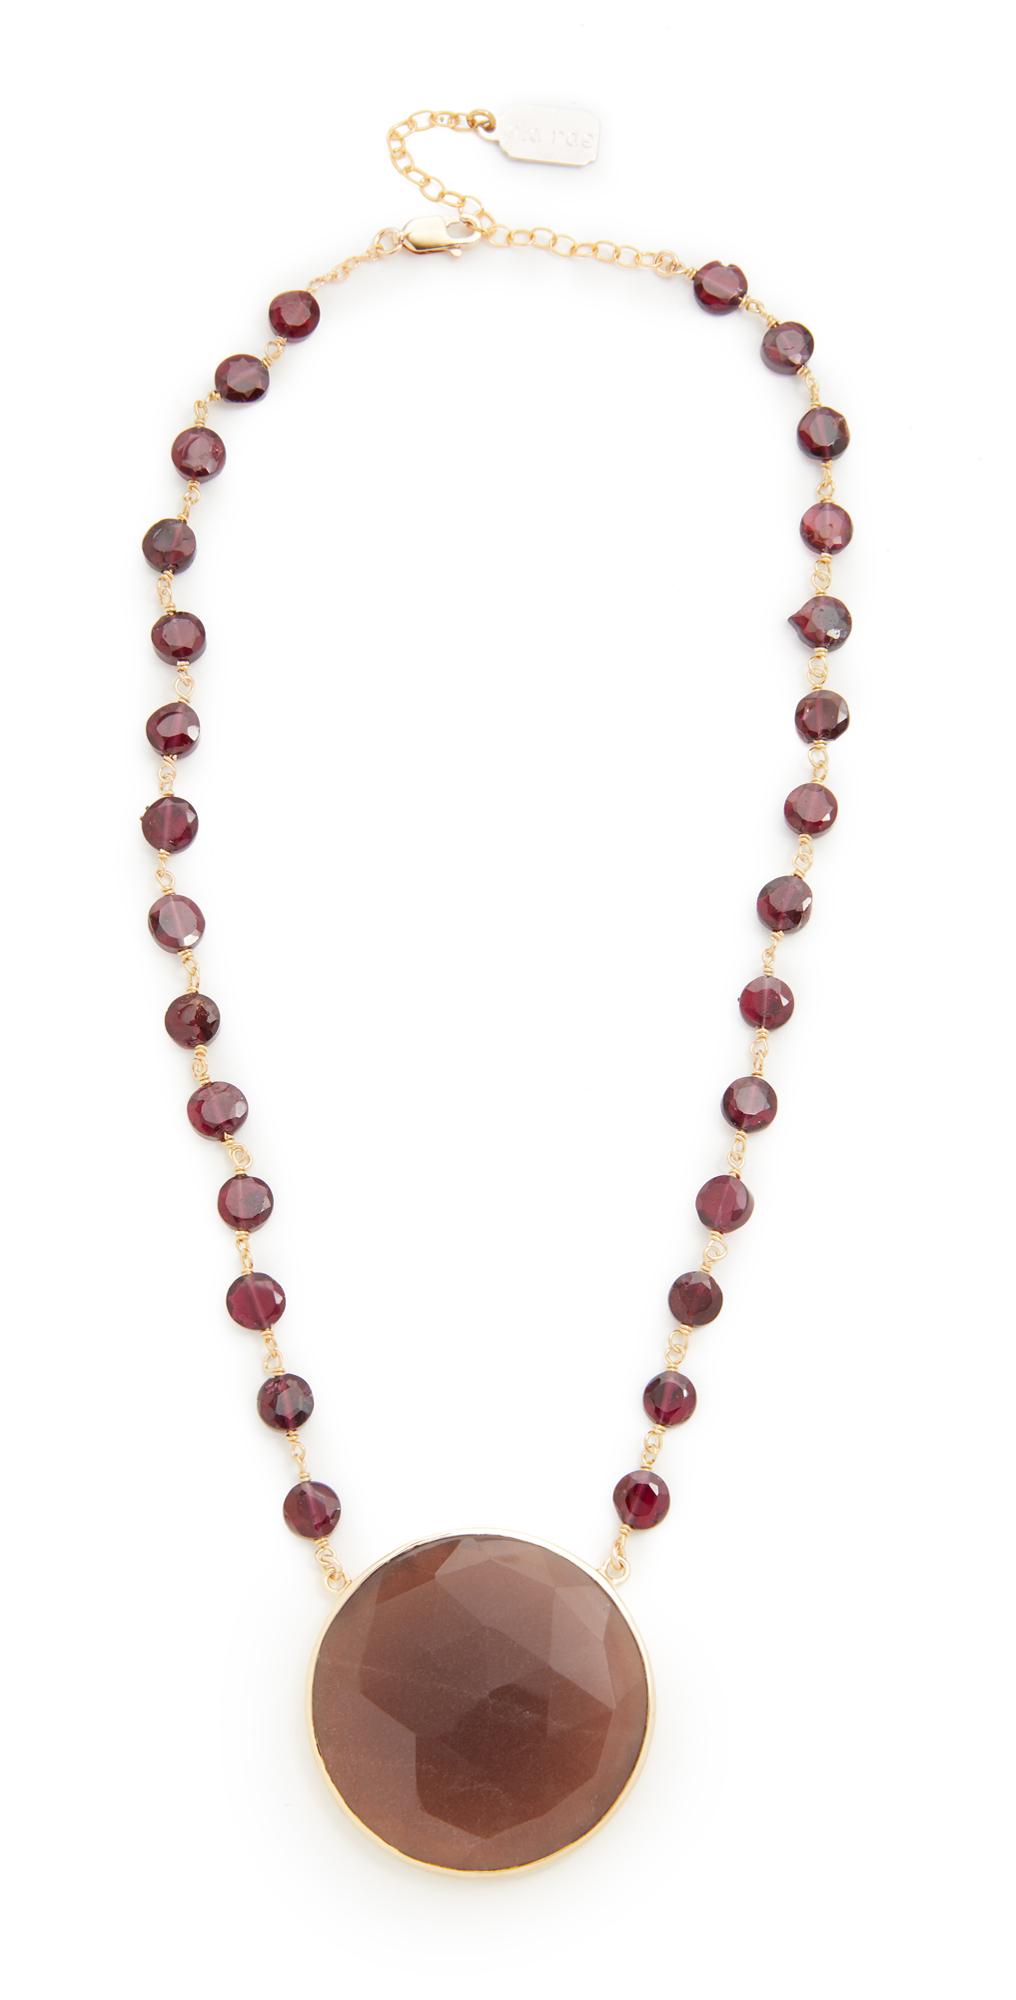 Moonstone Pendant Necklace Ela Rae